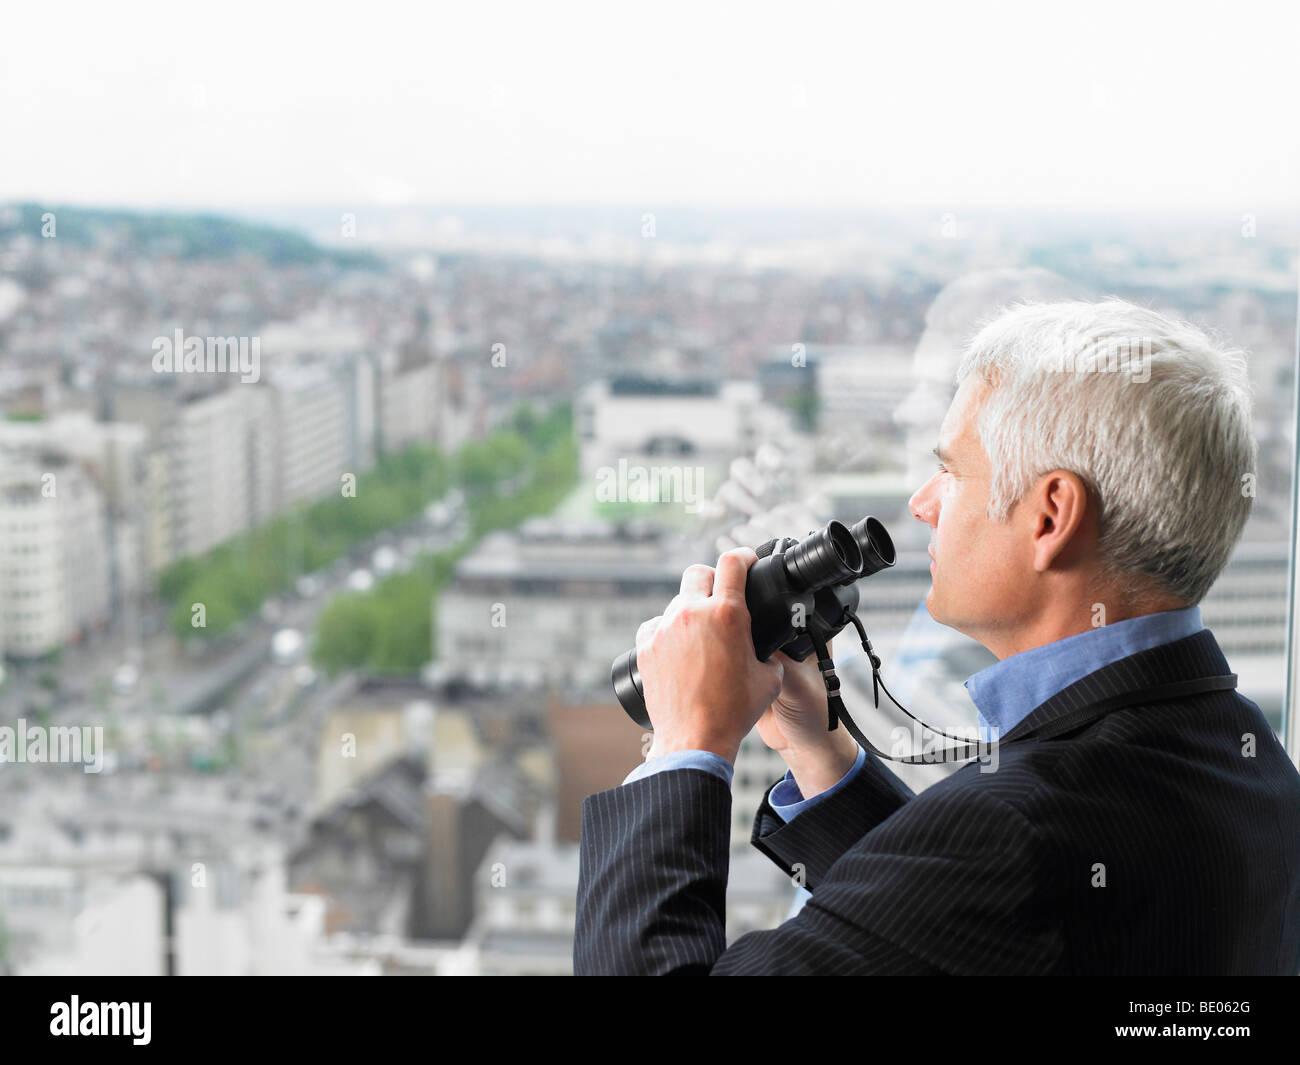 Man with binoculars - Stock Image